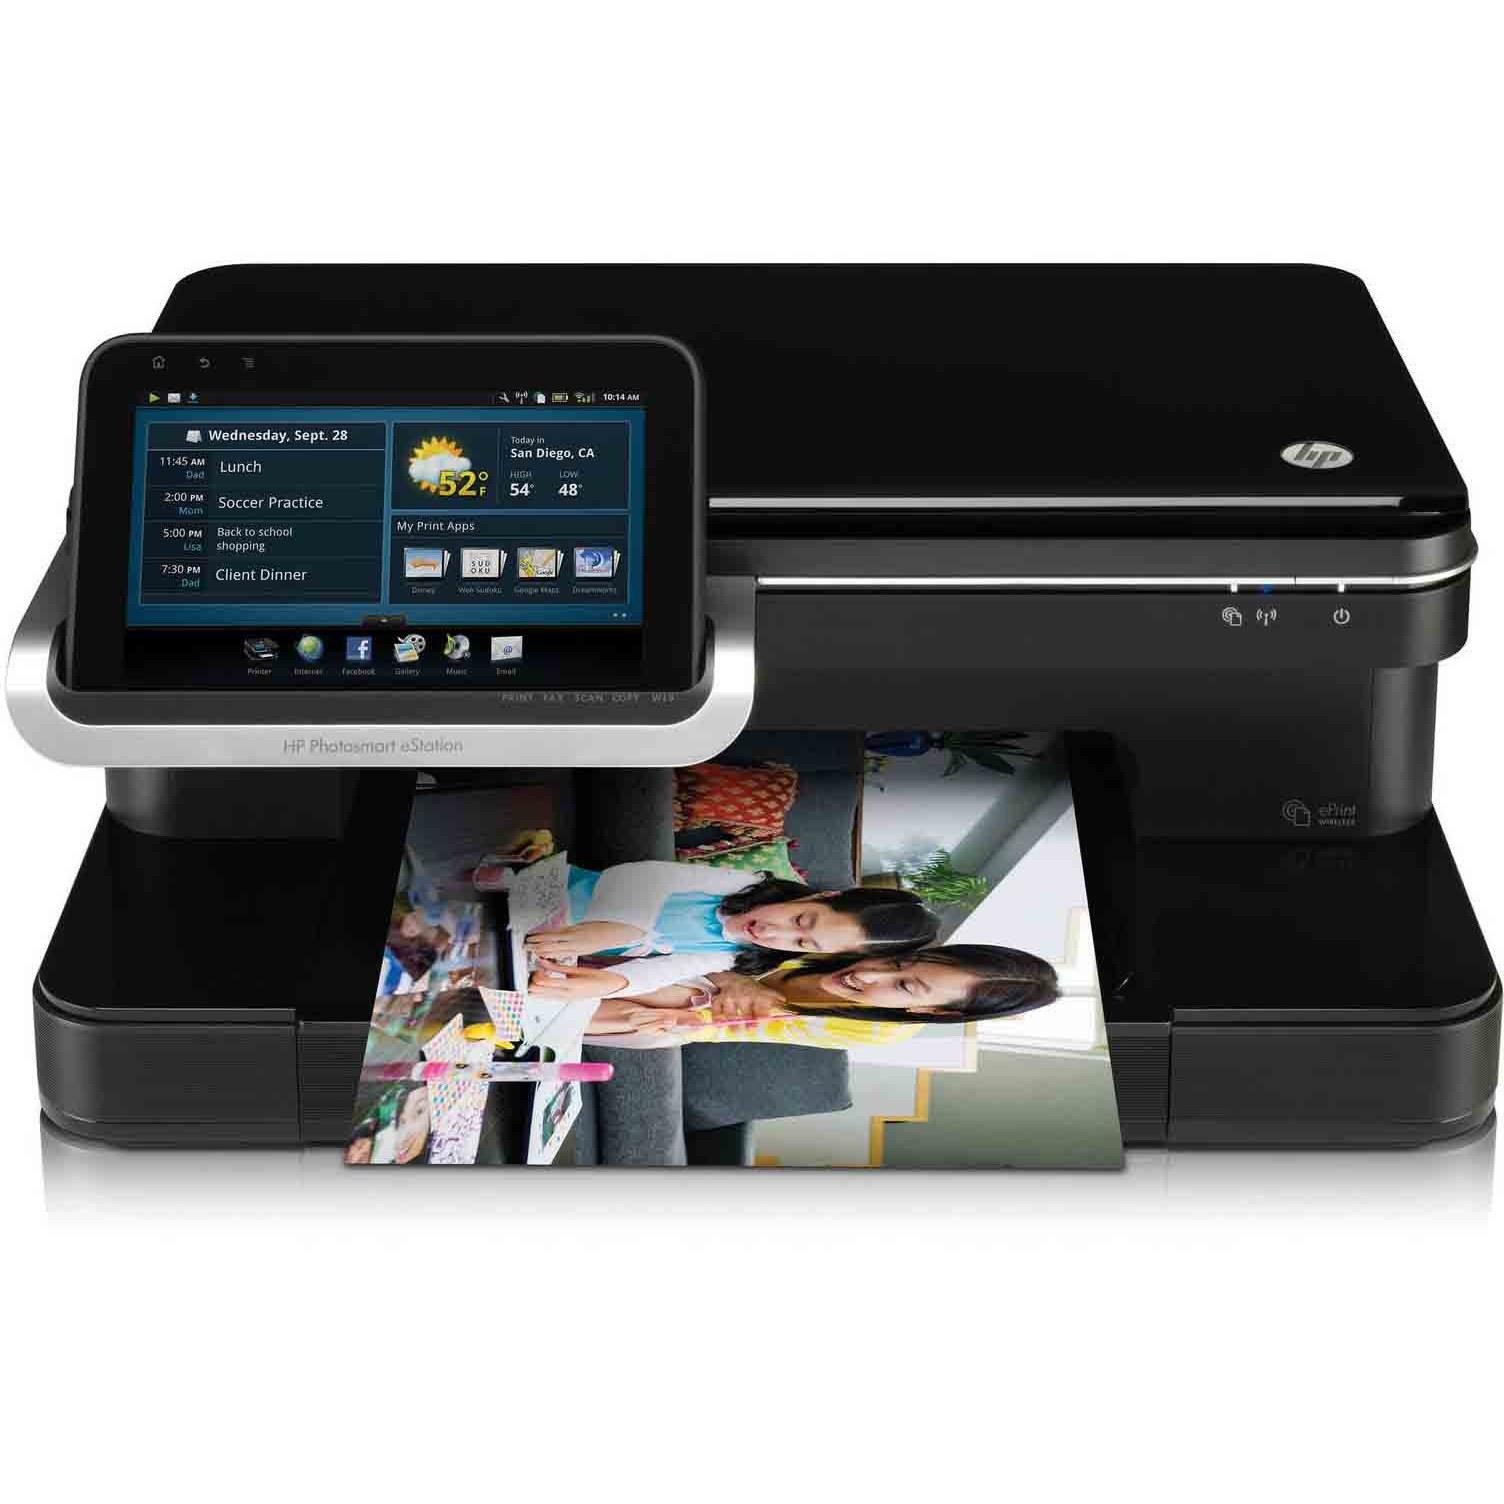 image پرینتر چندکاره جوهرافشان اچ پی مدل C510 HP Inkjet Multifunction Printer Model C510